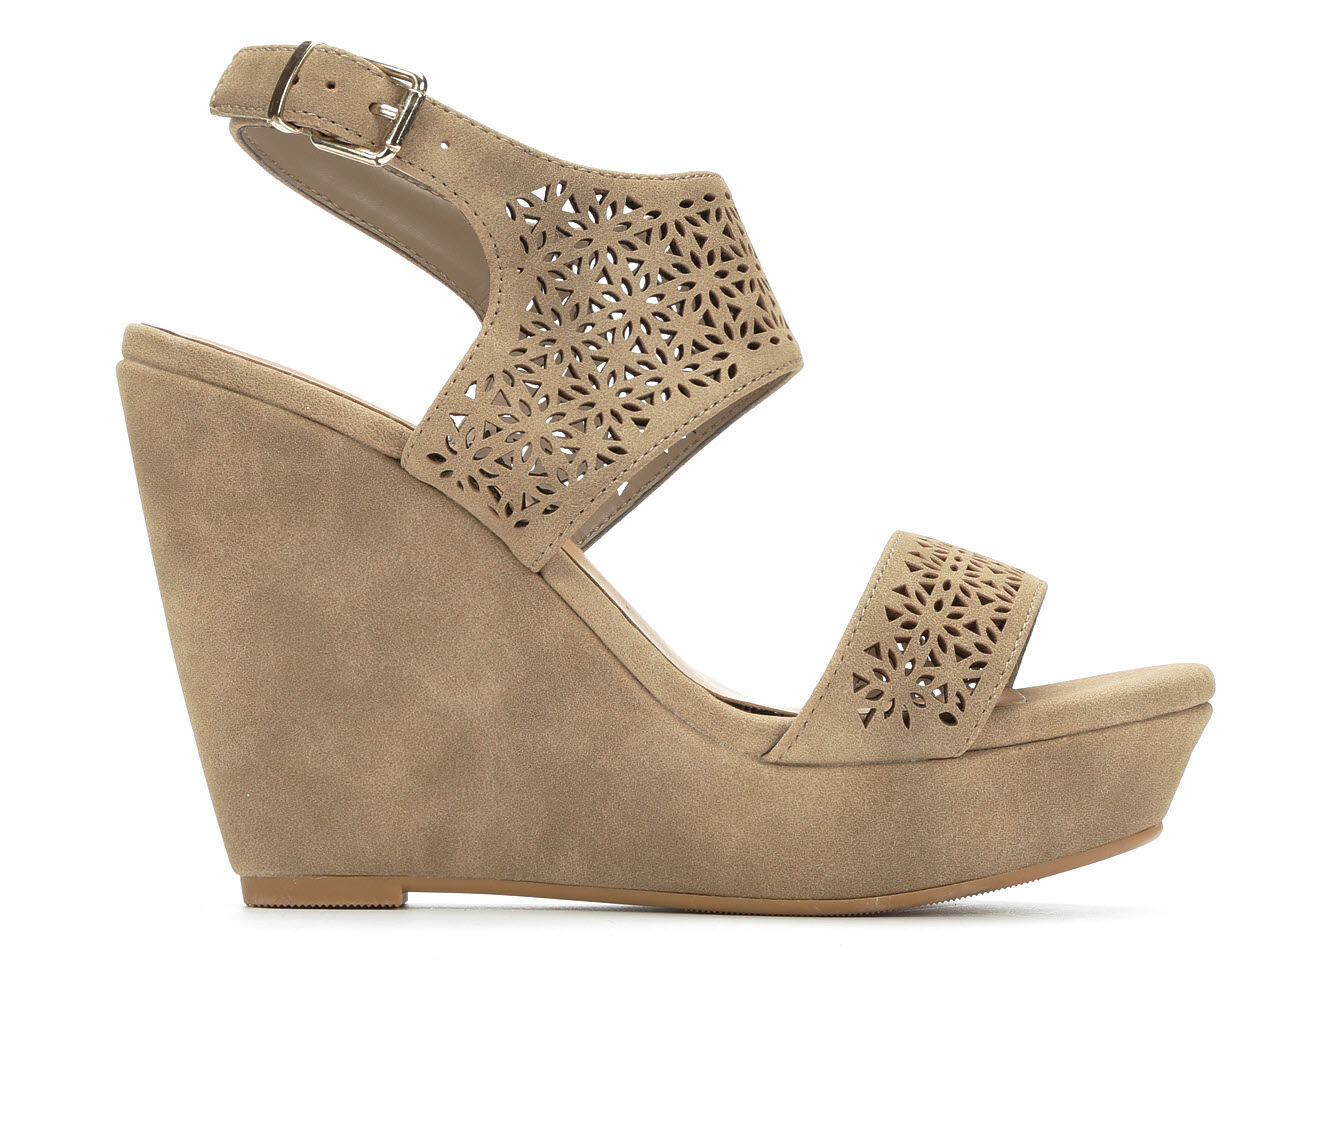 Women's Y-Not Zelda Wedge Sandals buy cheap clearance i2UMcCt